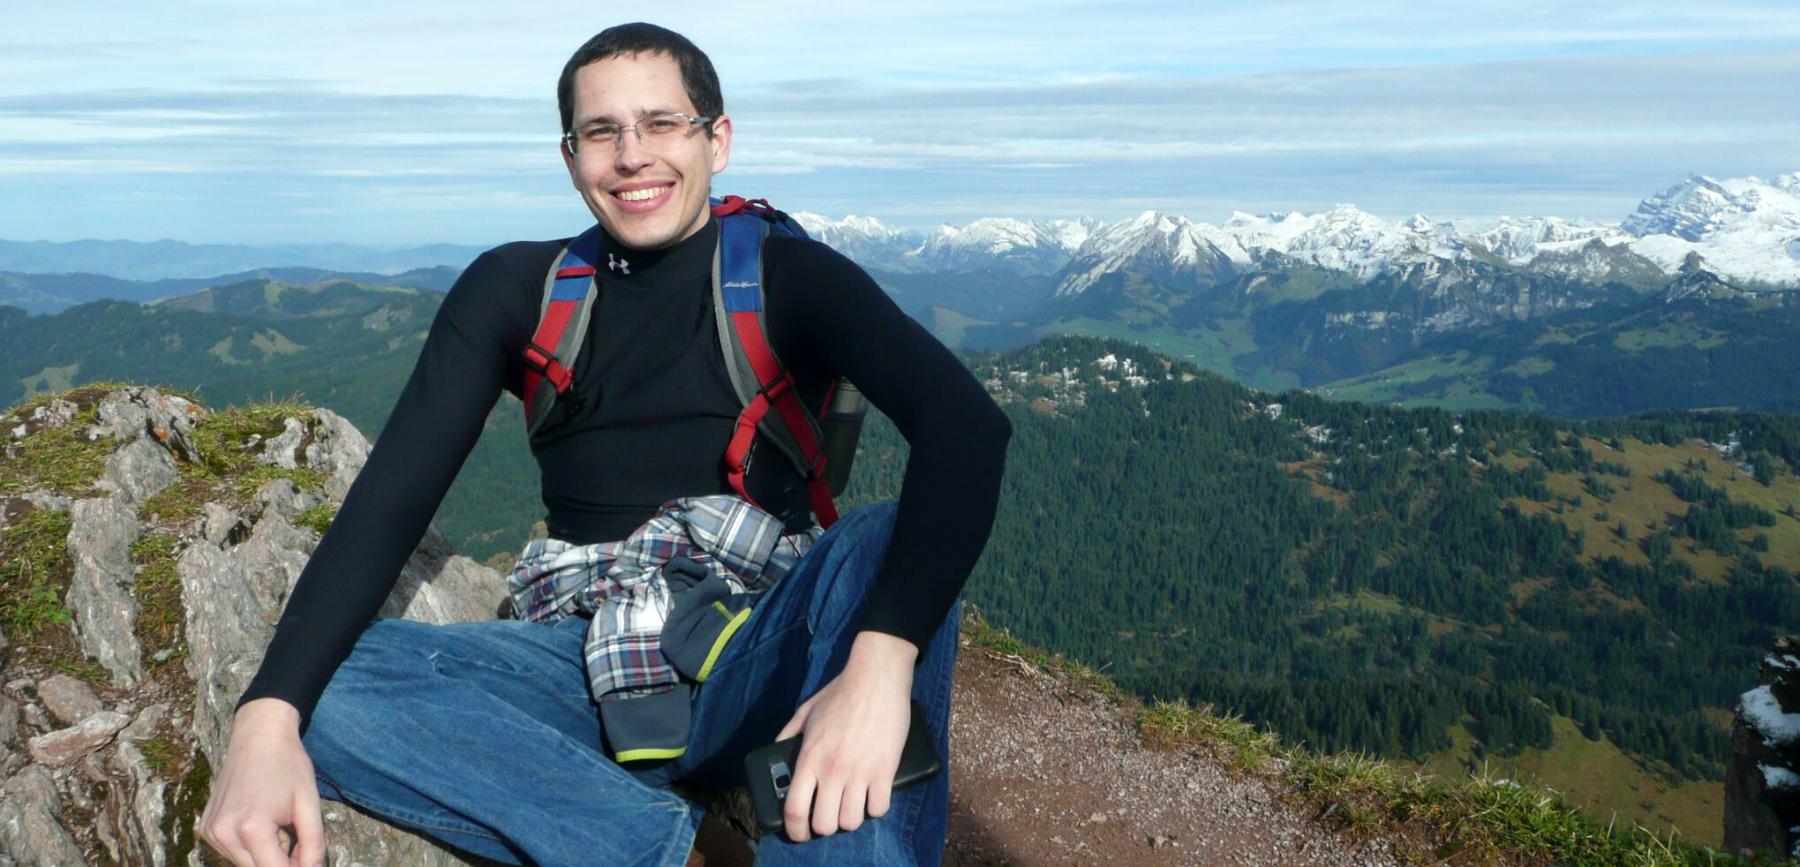 Andrew Porter in Swizterland on study abroad